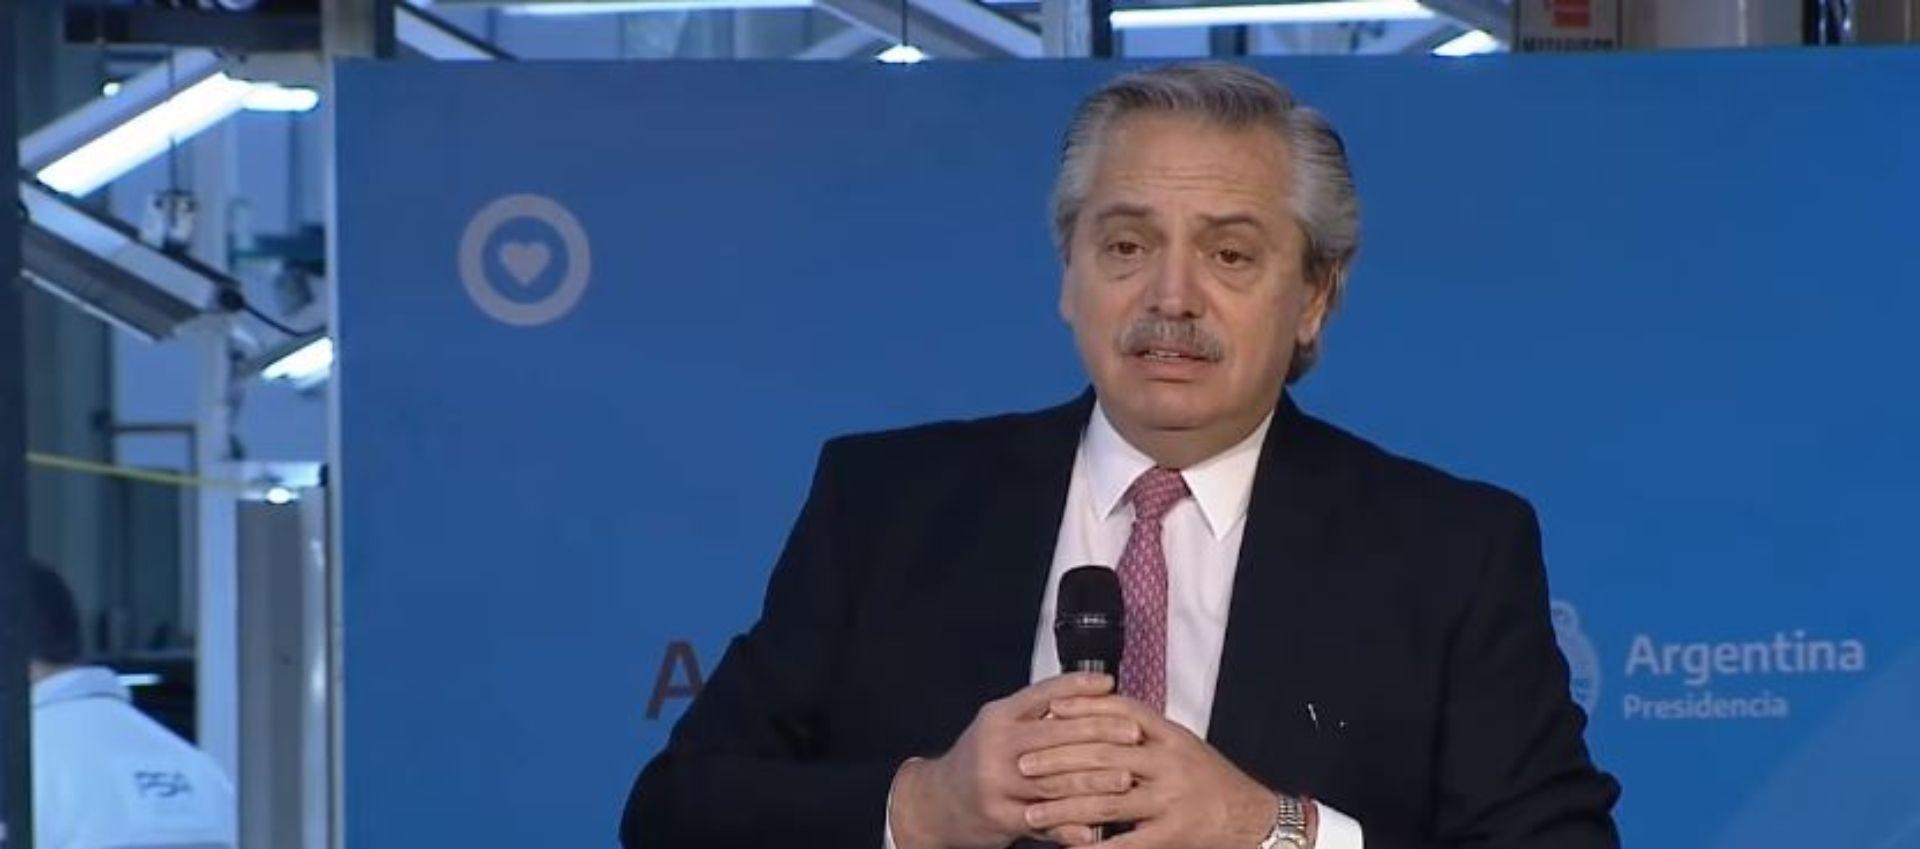 Alberto Fernández viajará mañana a San Juan para recorrer obras públicas